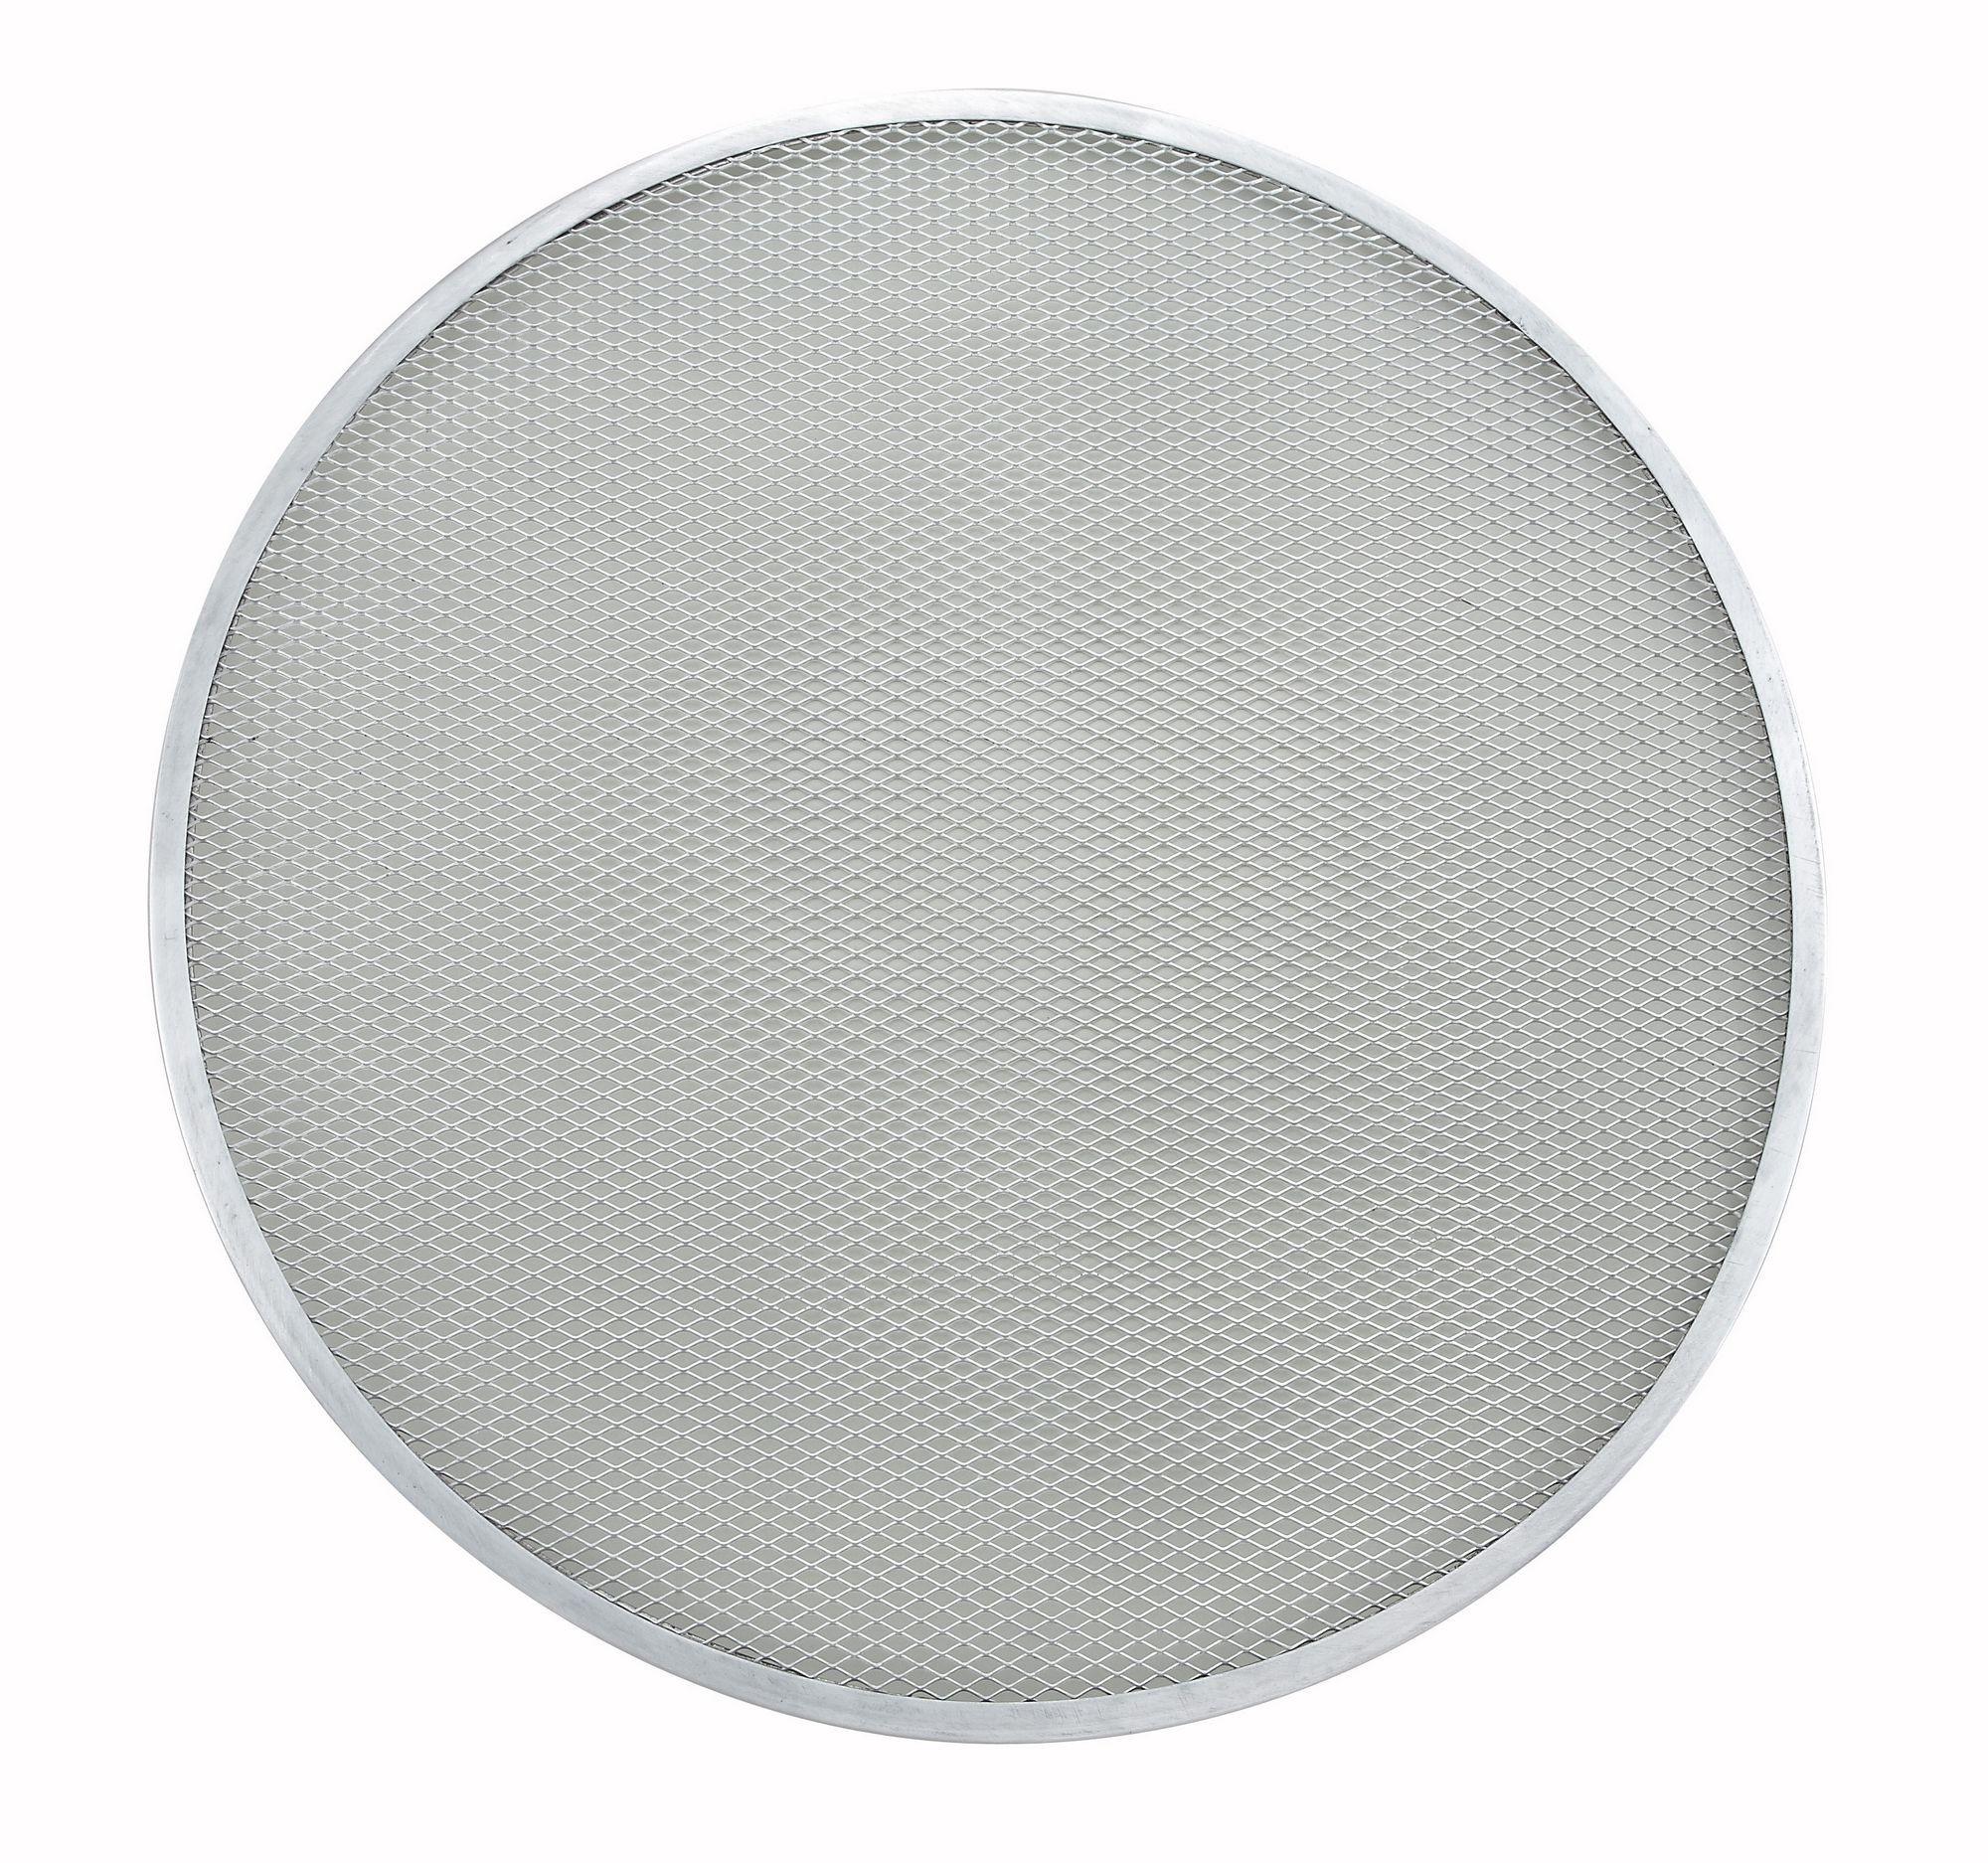 Seamless Aluminum Pizza Screen - 19